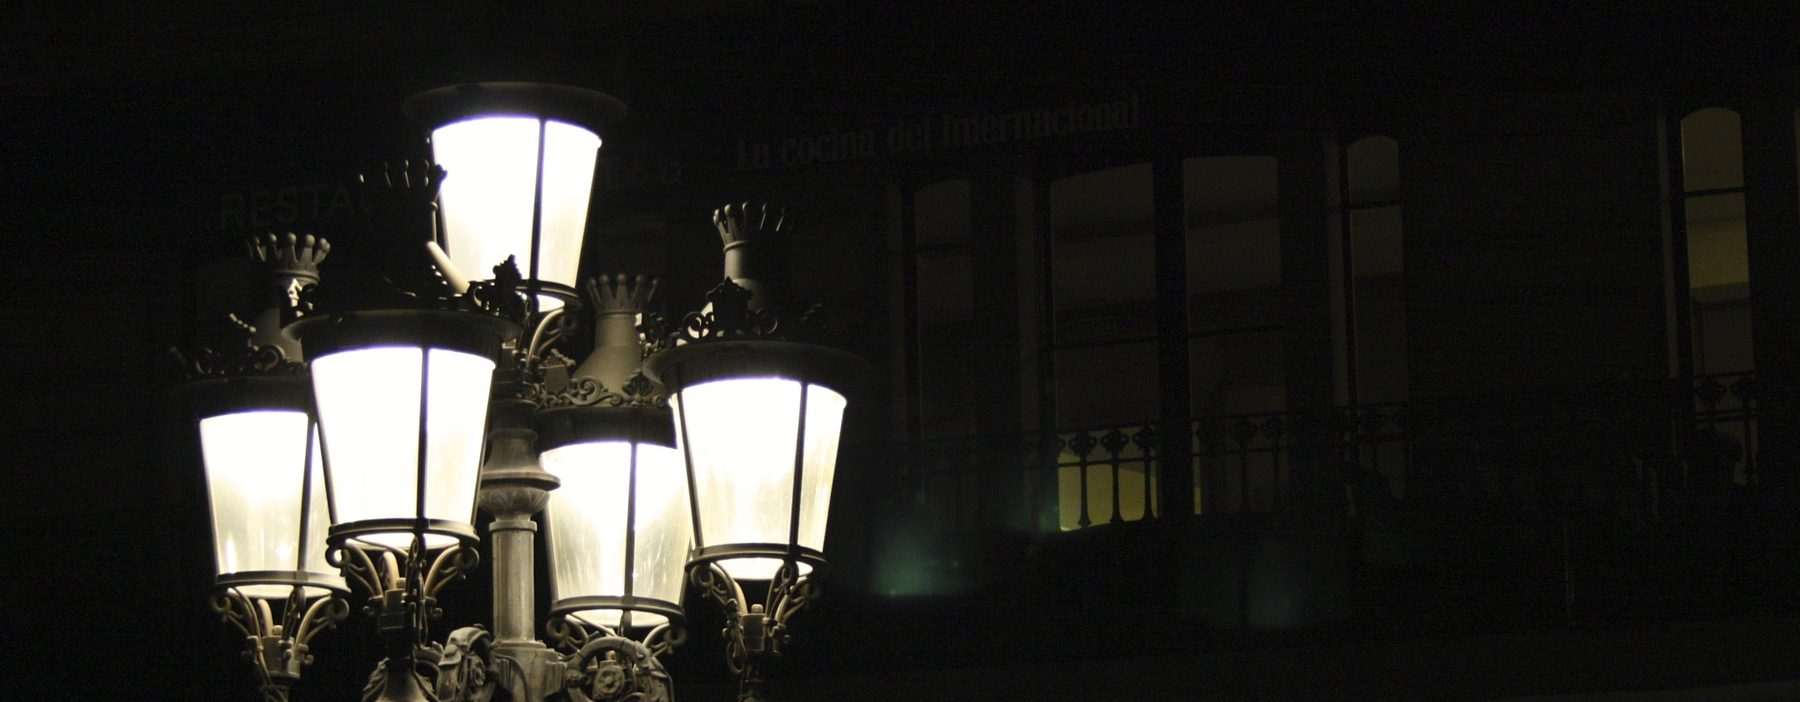 Light-night-darkness-street-light-black-monochrome-106821-pxhere.com_-e1599653247375